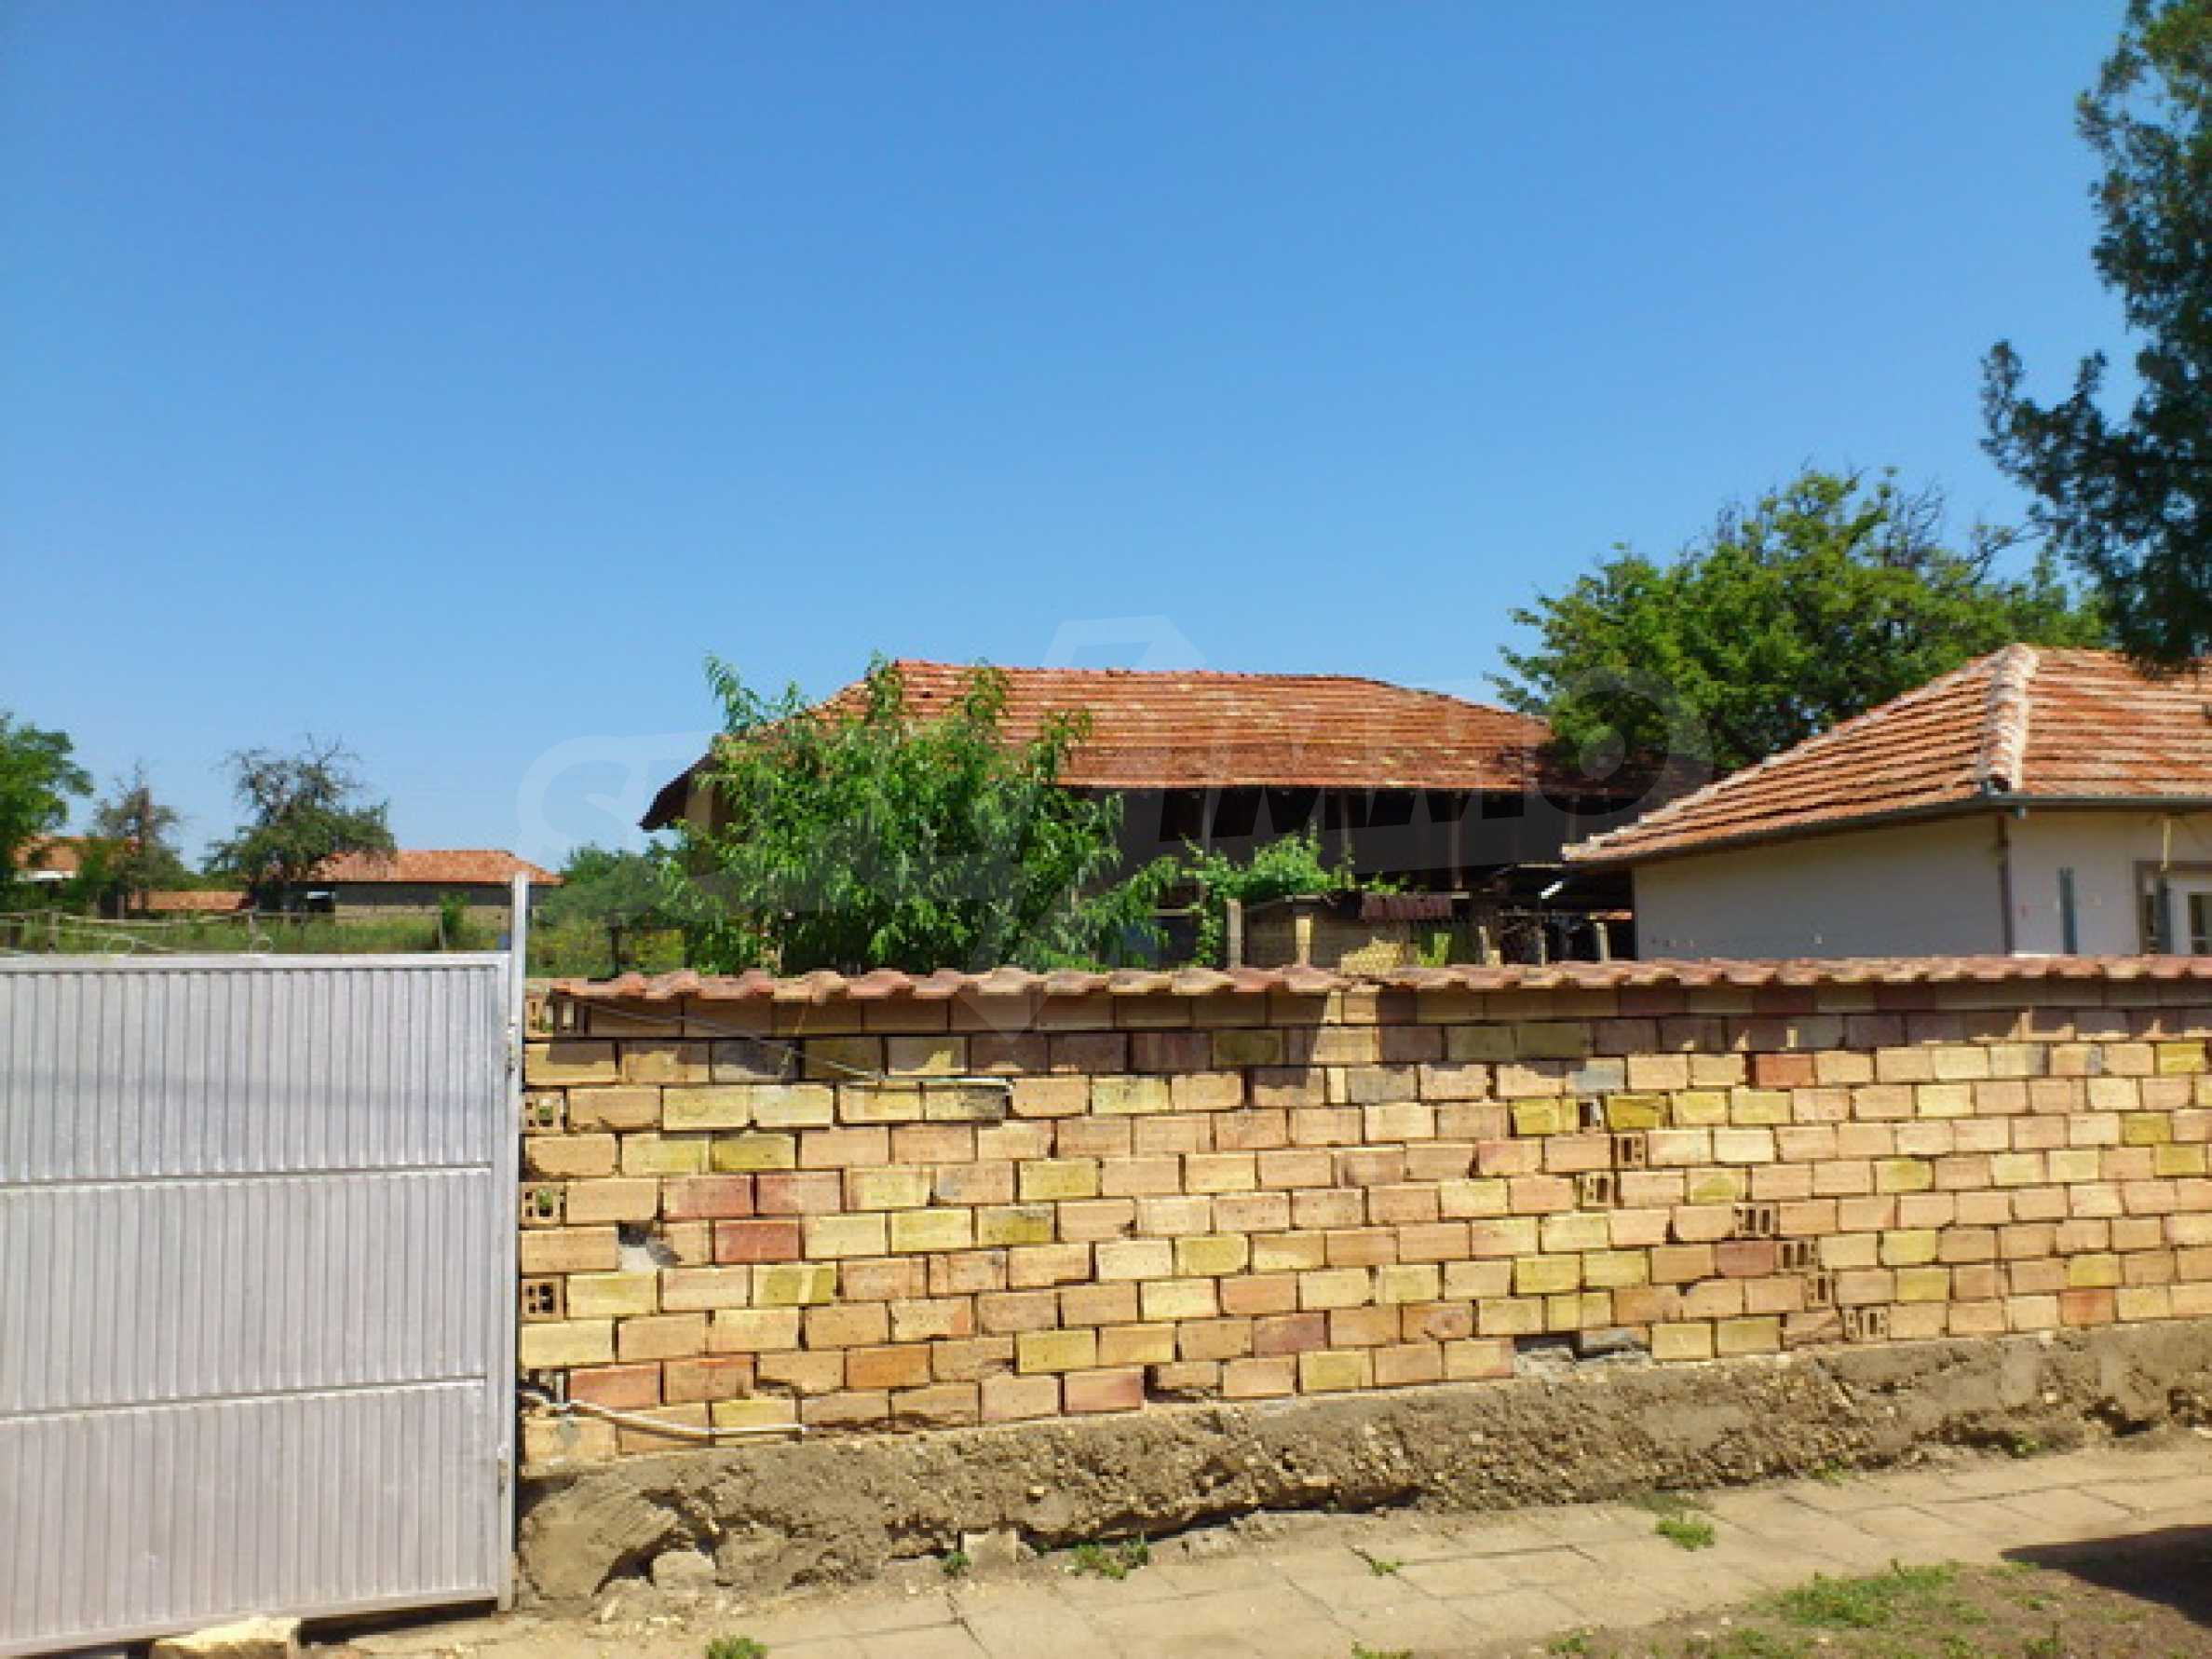 Renovated farmhouse in excellent condition in a village 45 km. from Veliko Tarnovo 37